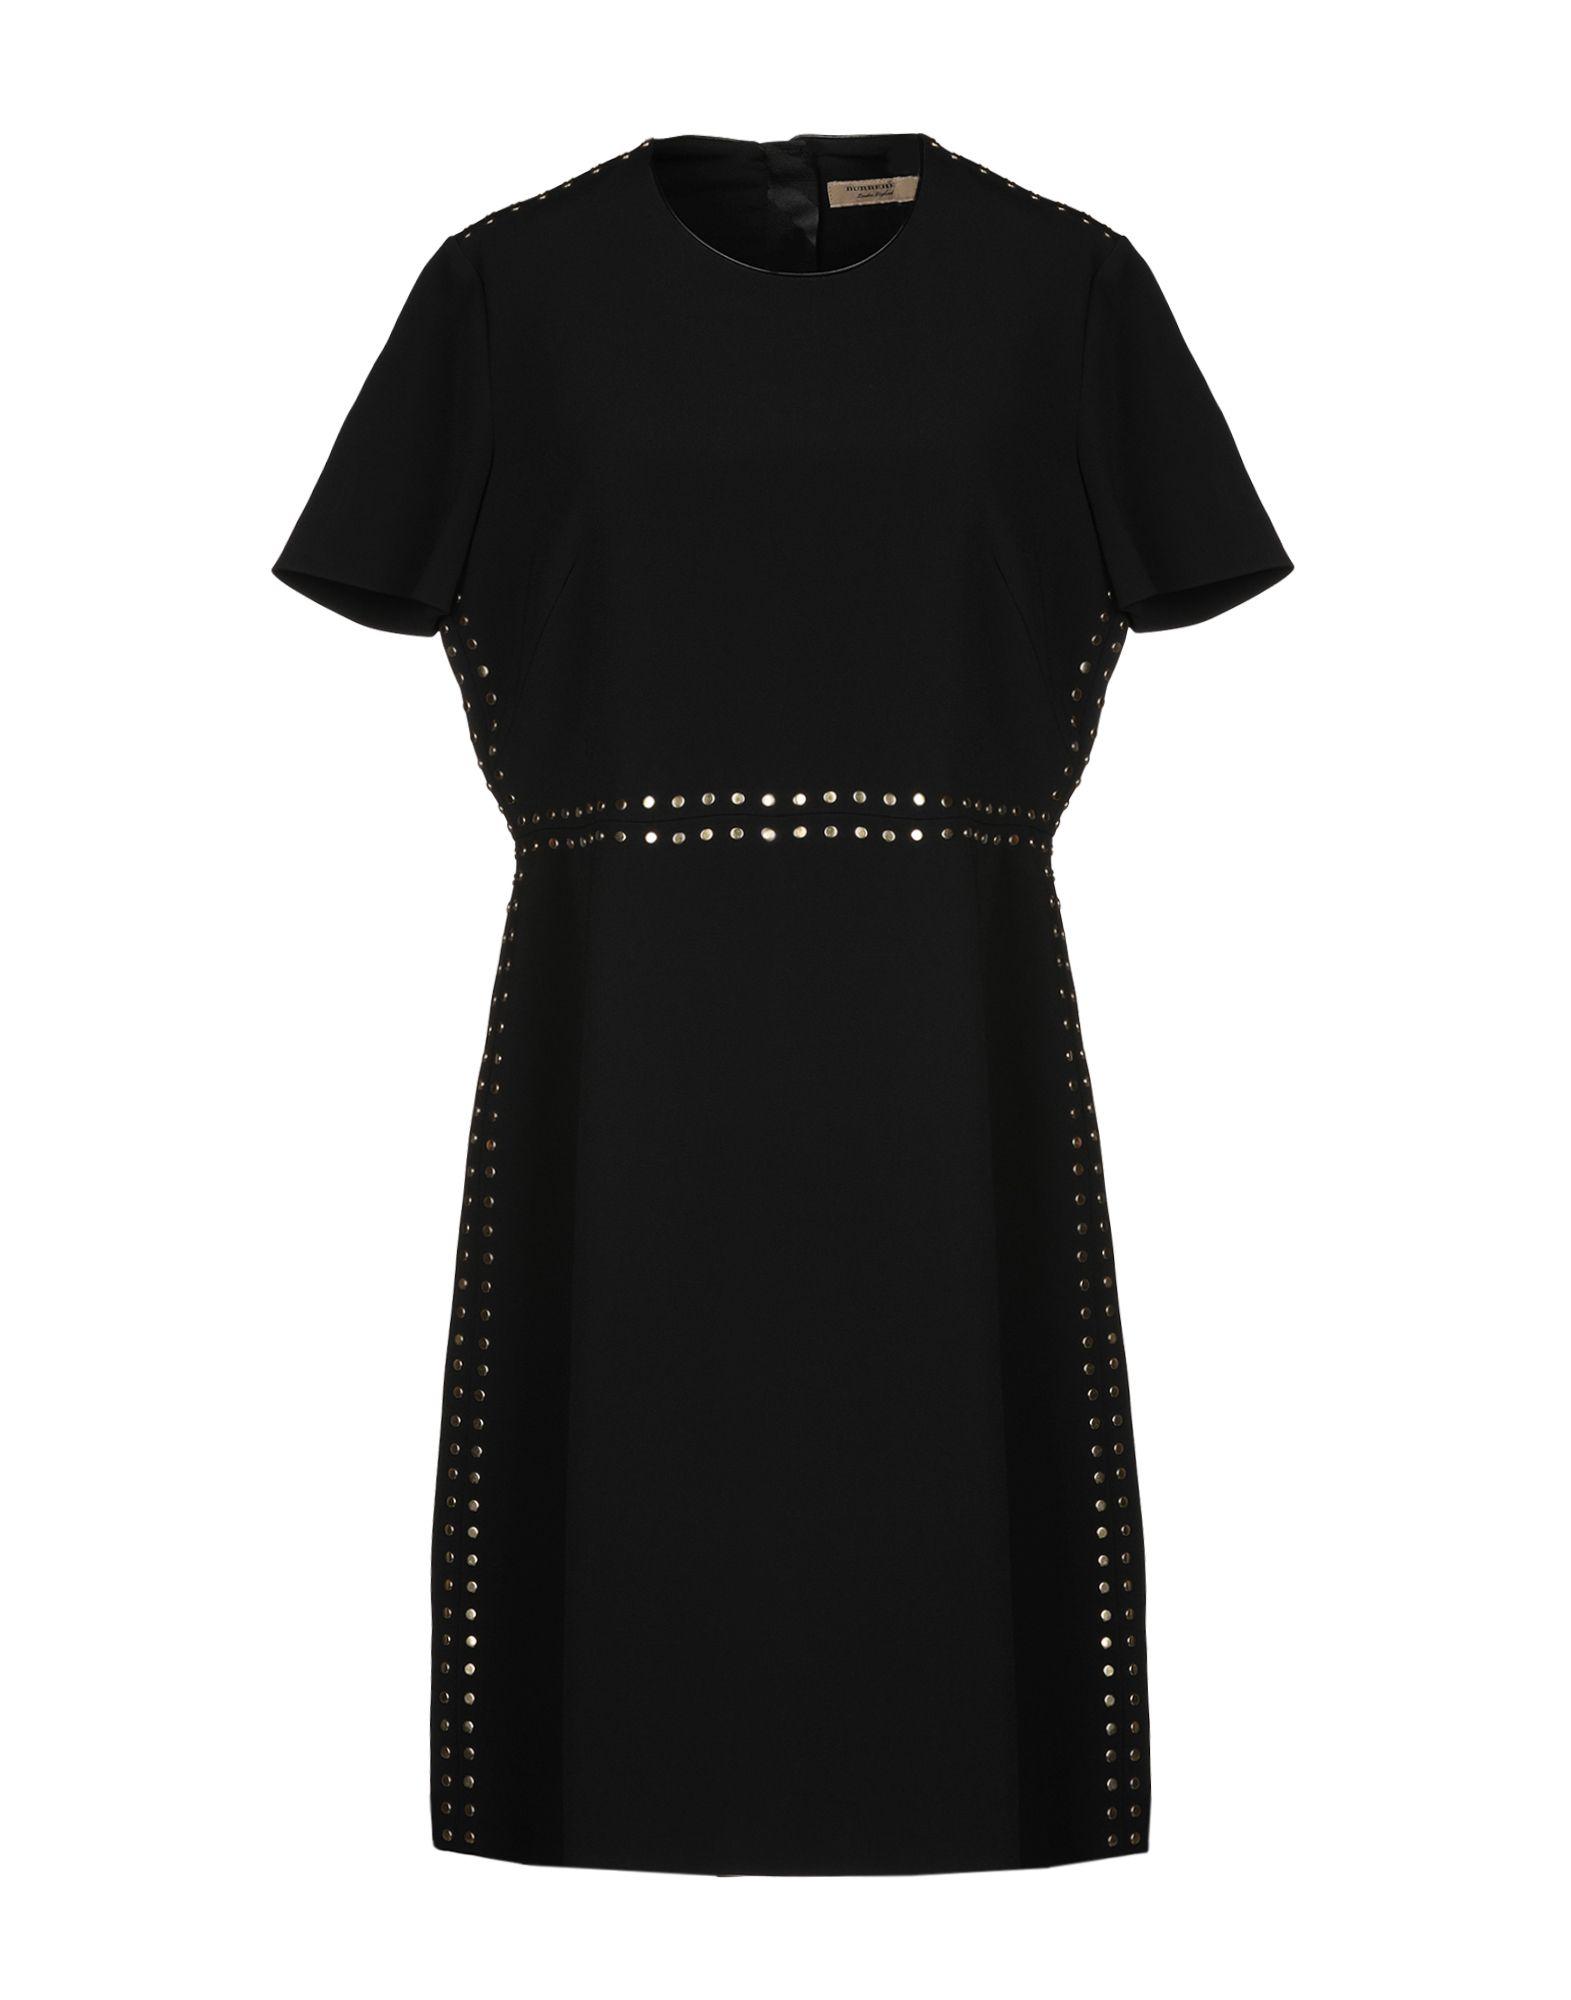 b40ab049a5 BURBERRY - Γυναικεία Κοντά Φορέματα